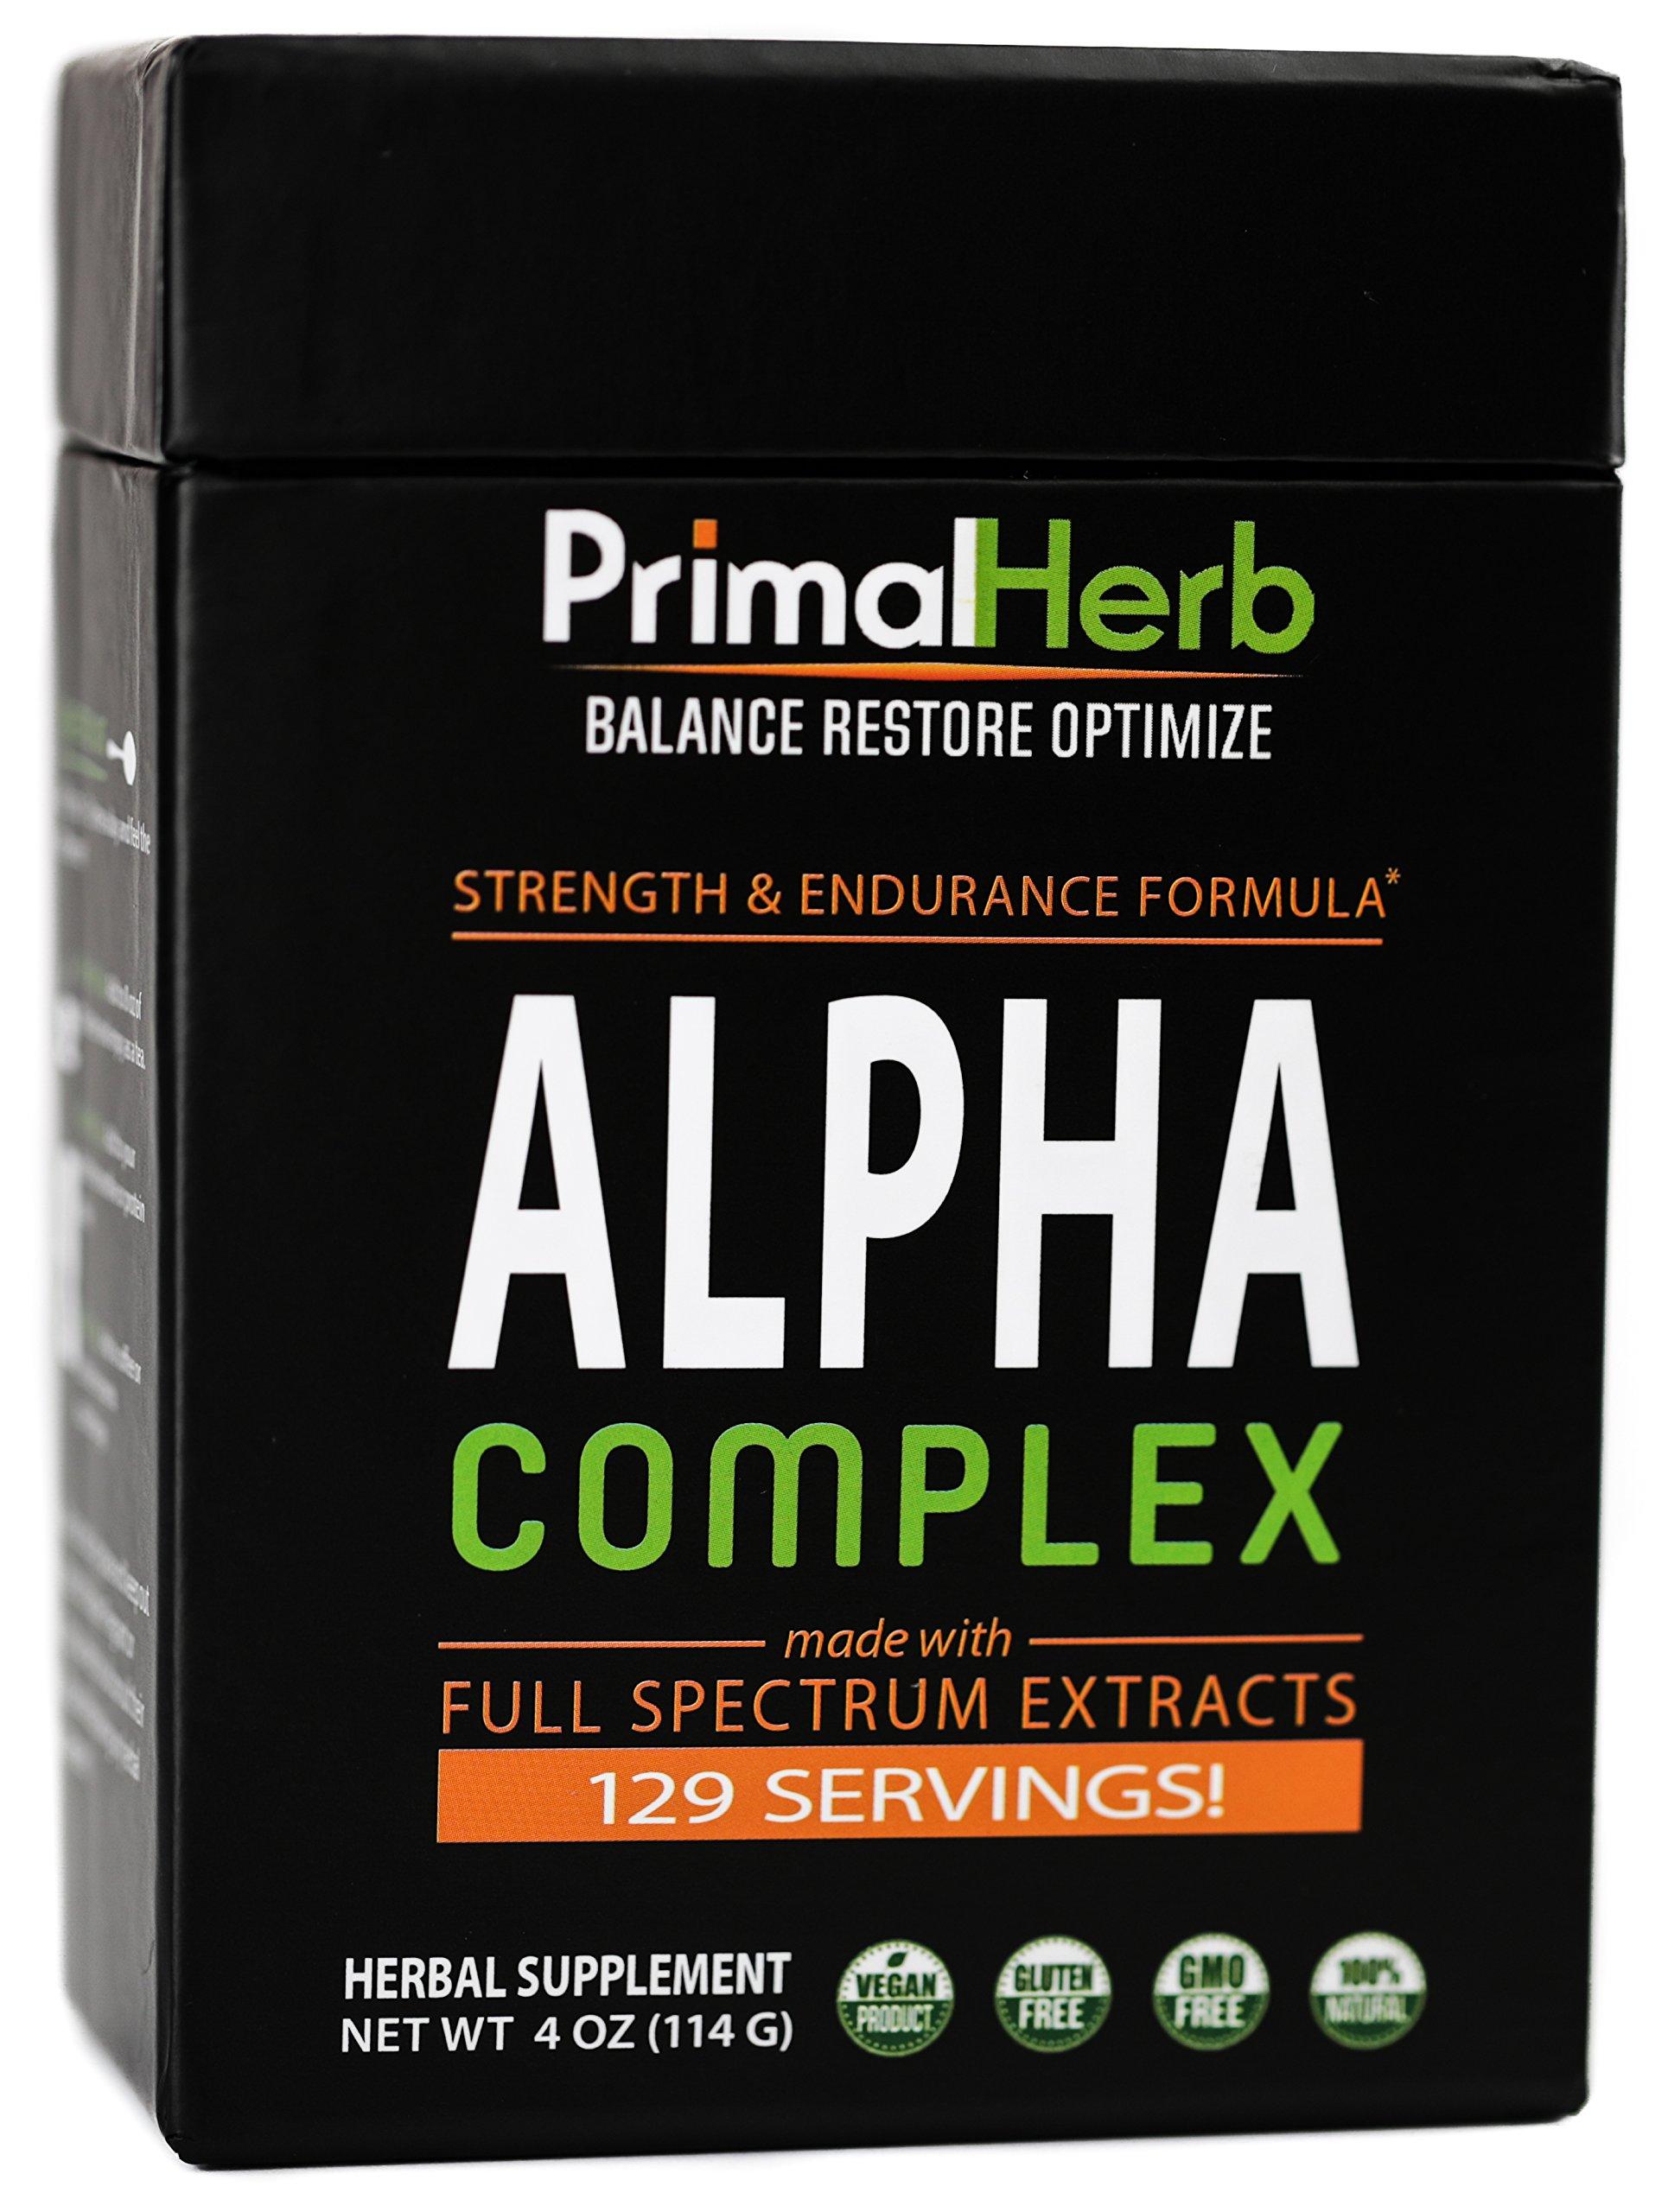 Alpha Complex – Strength & Performance - Testosterone Booster - 124 Servings - Long Jack Tongkat Ali 200:1 - Mucuna Pruriens - Icariin Extract - Ashwagandha - Male Enhancement